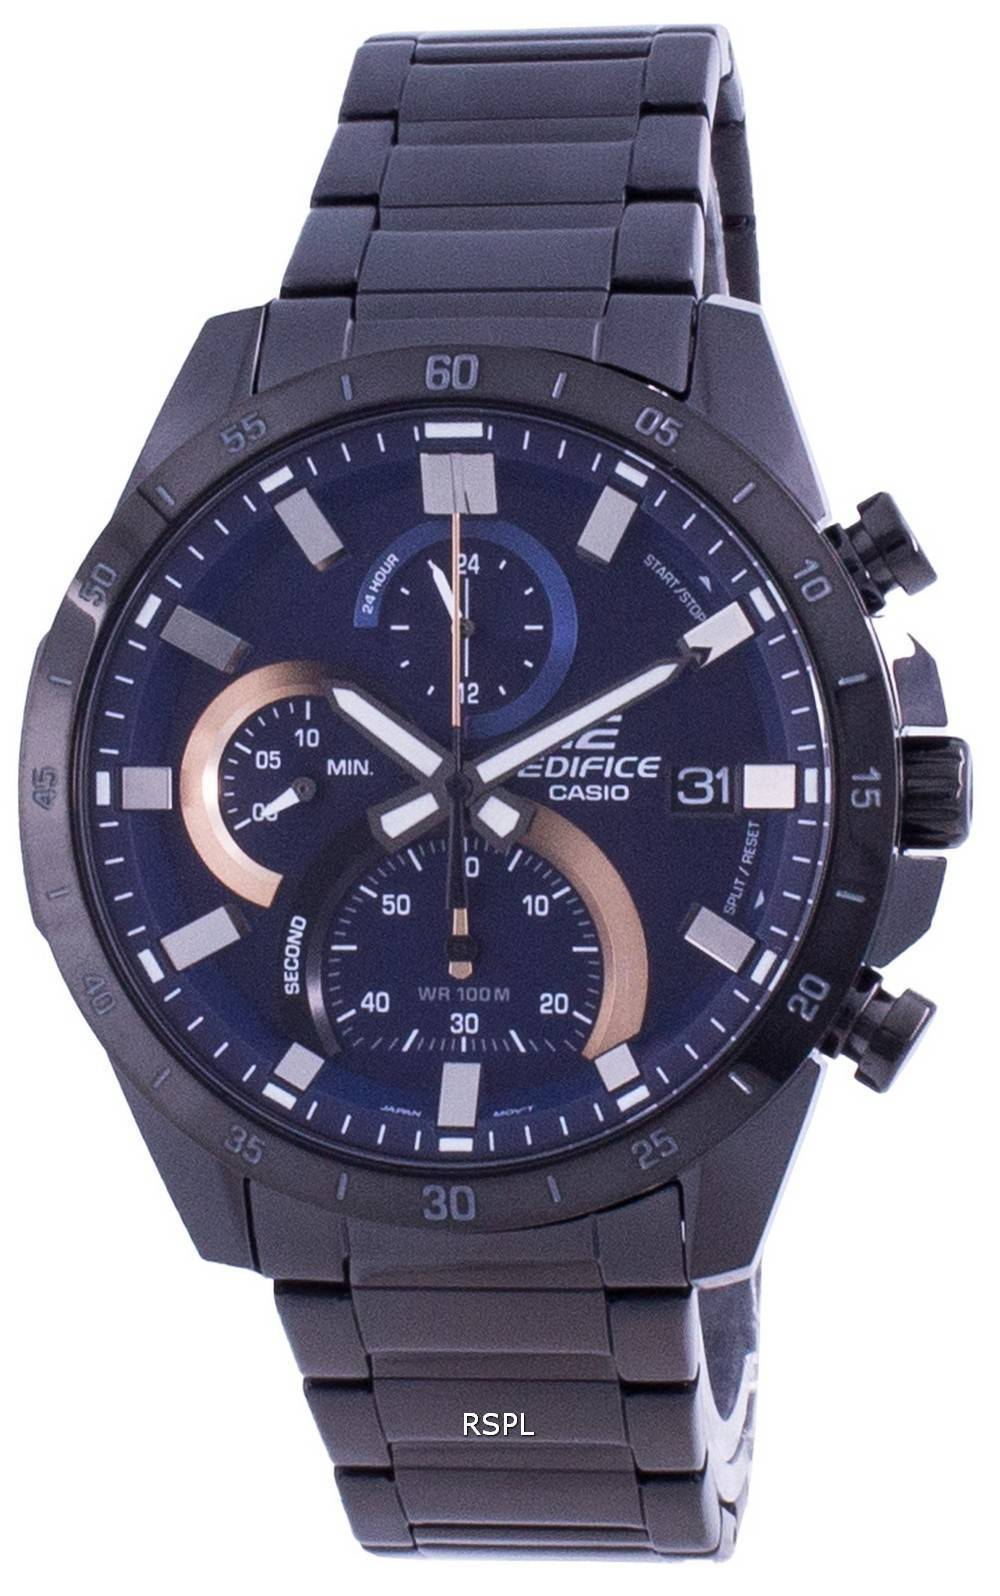 Casio rakennuksen standardi ajanoton kvartsi EFR-571DC-2A EFR571DC-2 miesten kello